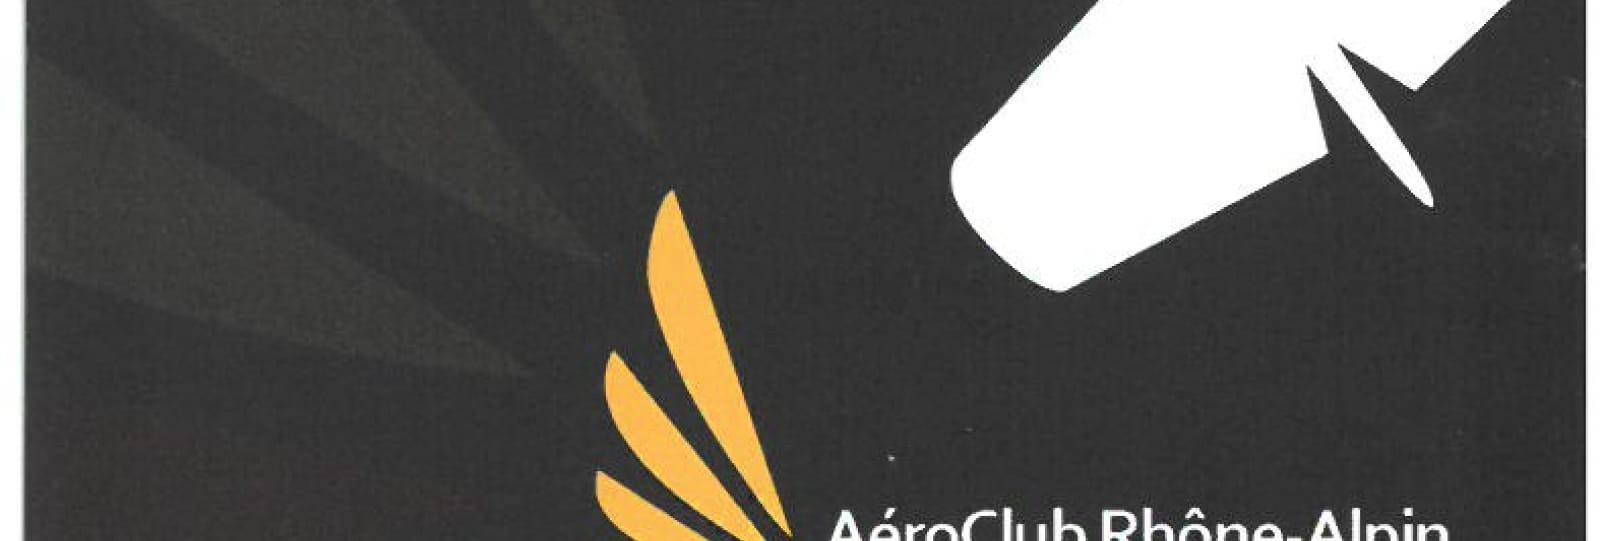 Vols Découverte Aéroclub Rhône-Alpin